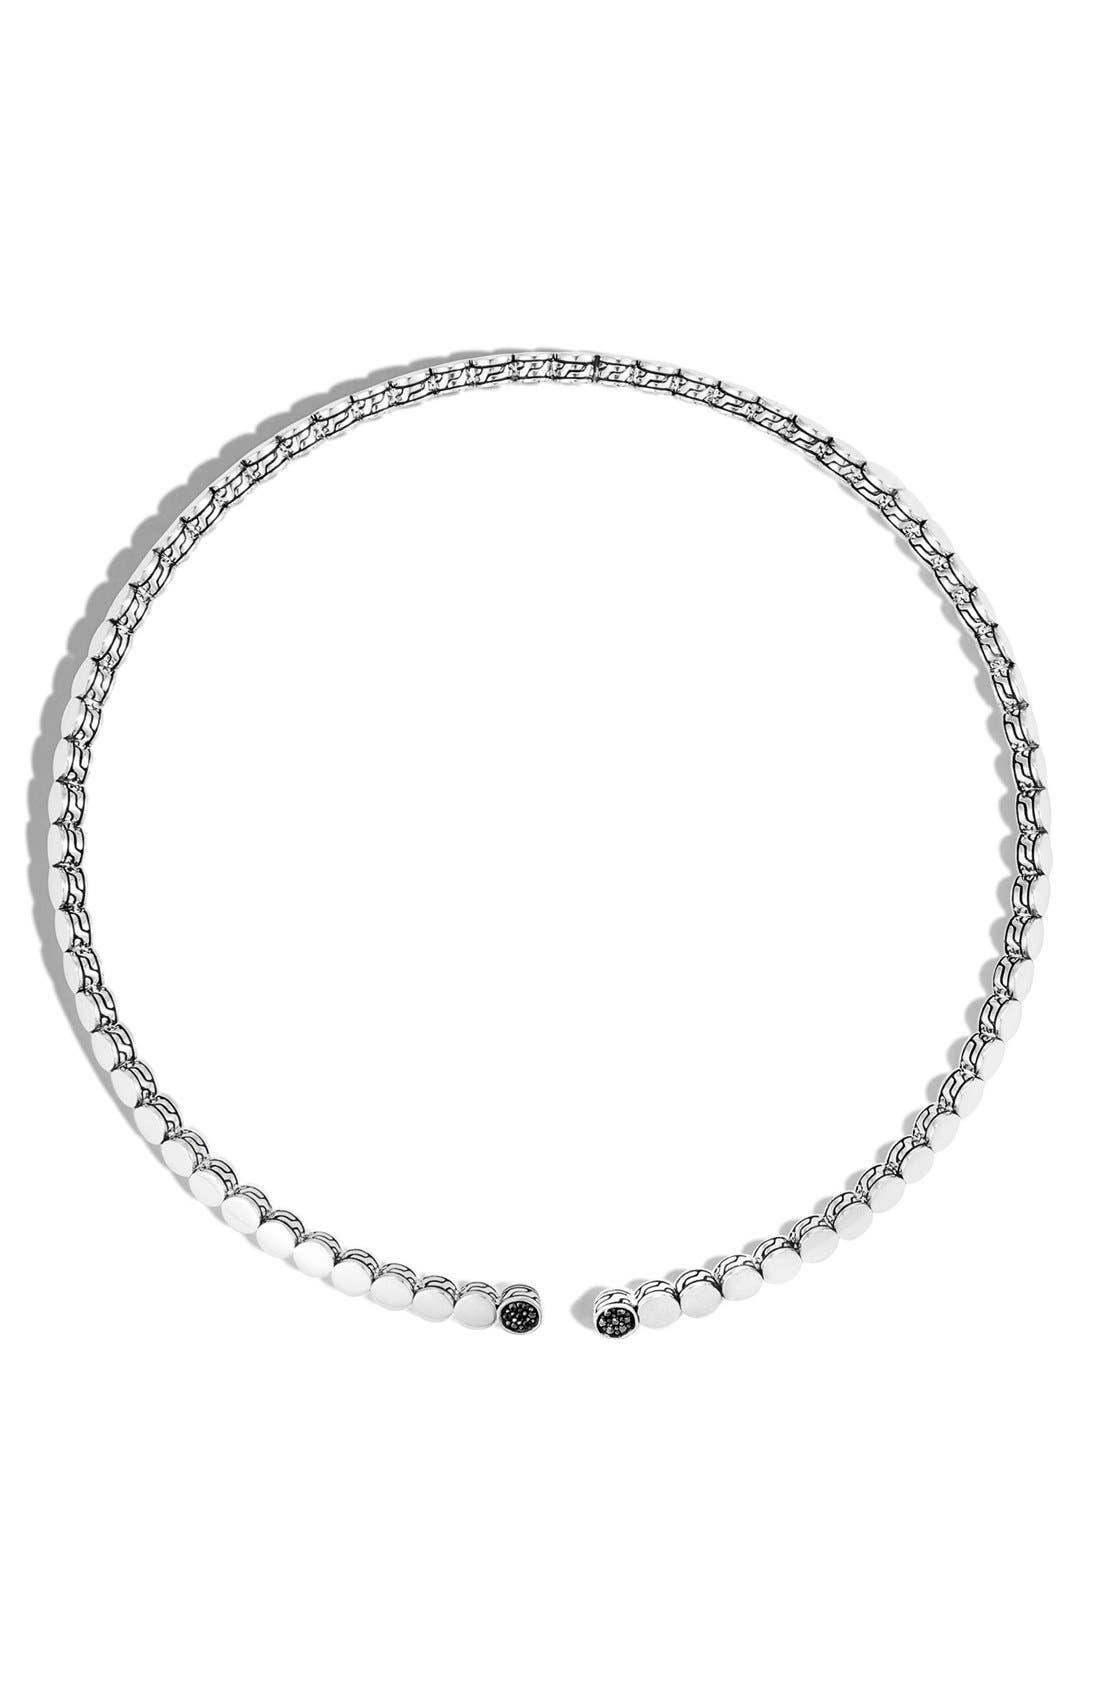 Alternate Image 1 Selected - John Hardy 'Dot' Silver Necklace